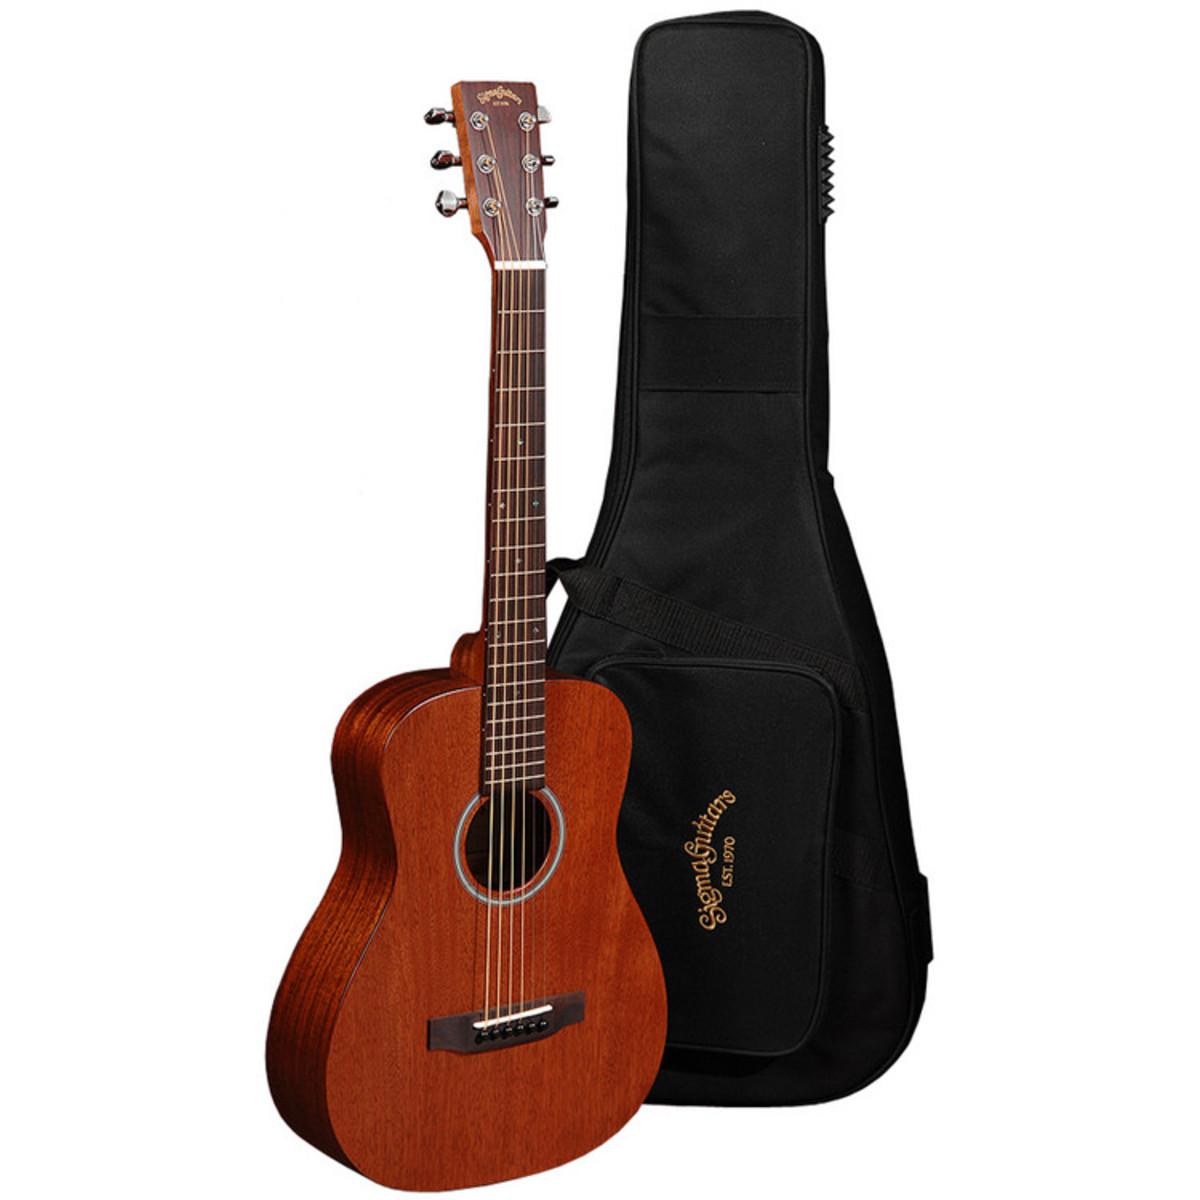 sigma tm 15 acoustic travel guitar mahogany at. Black Bedroom Furniture Sets. Home Design Ideas